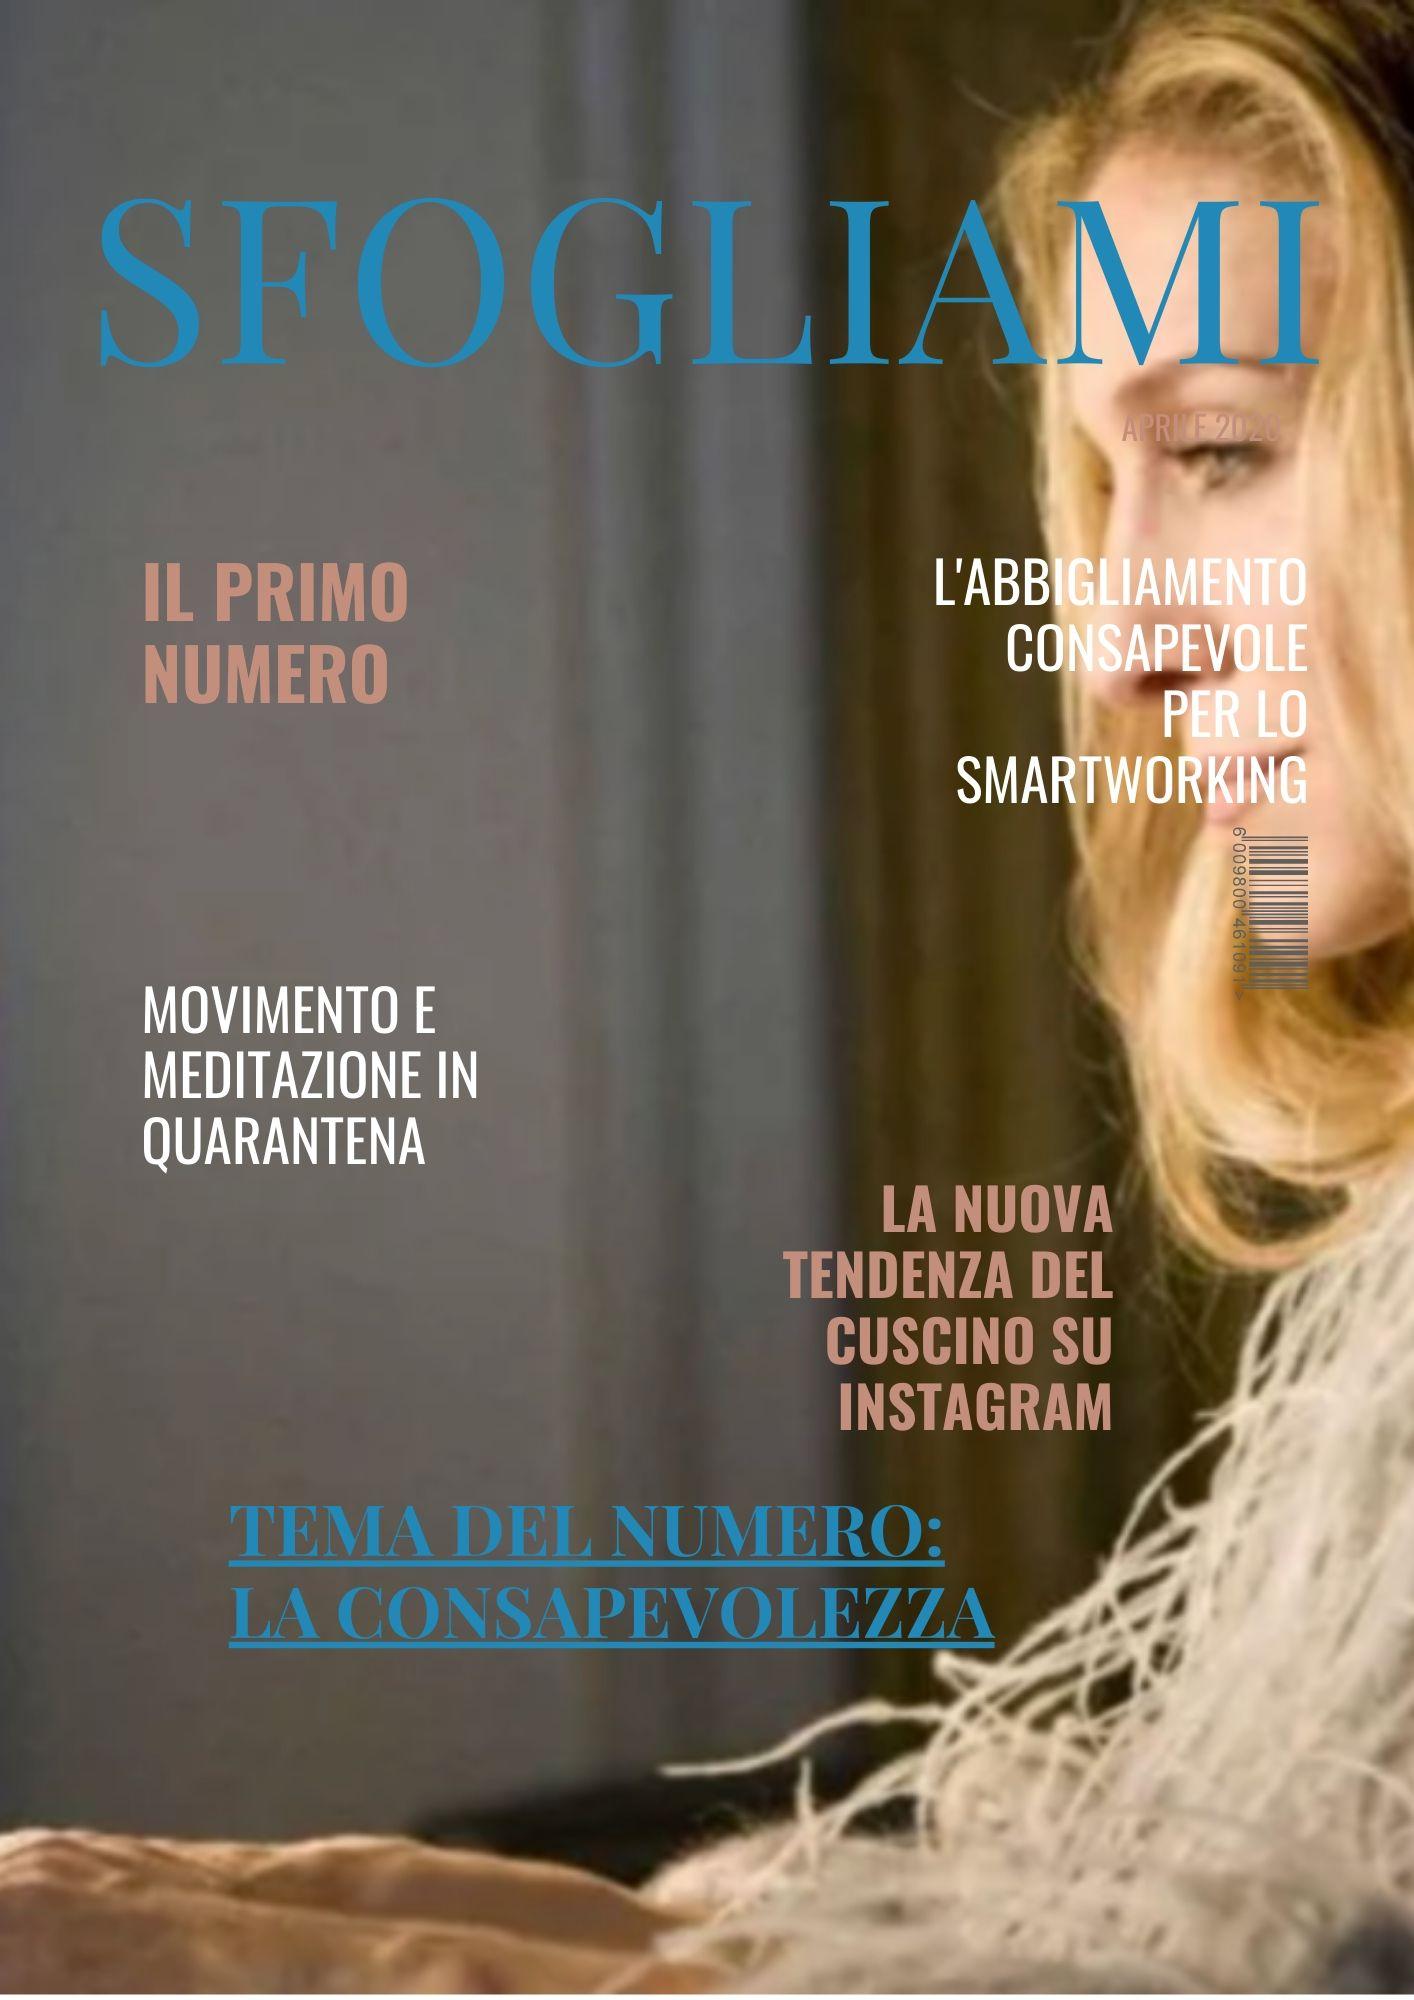 Web Magazine Coming Soon!